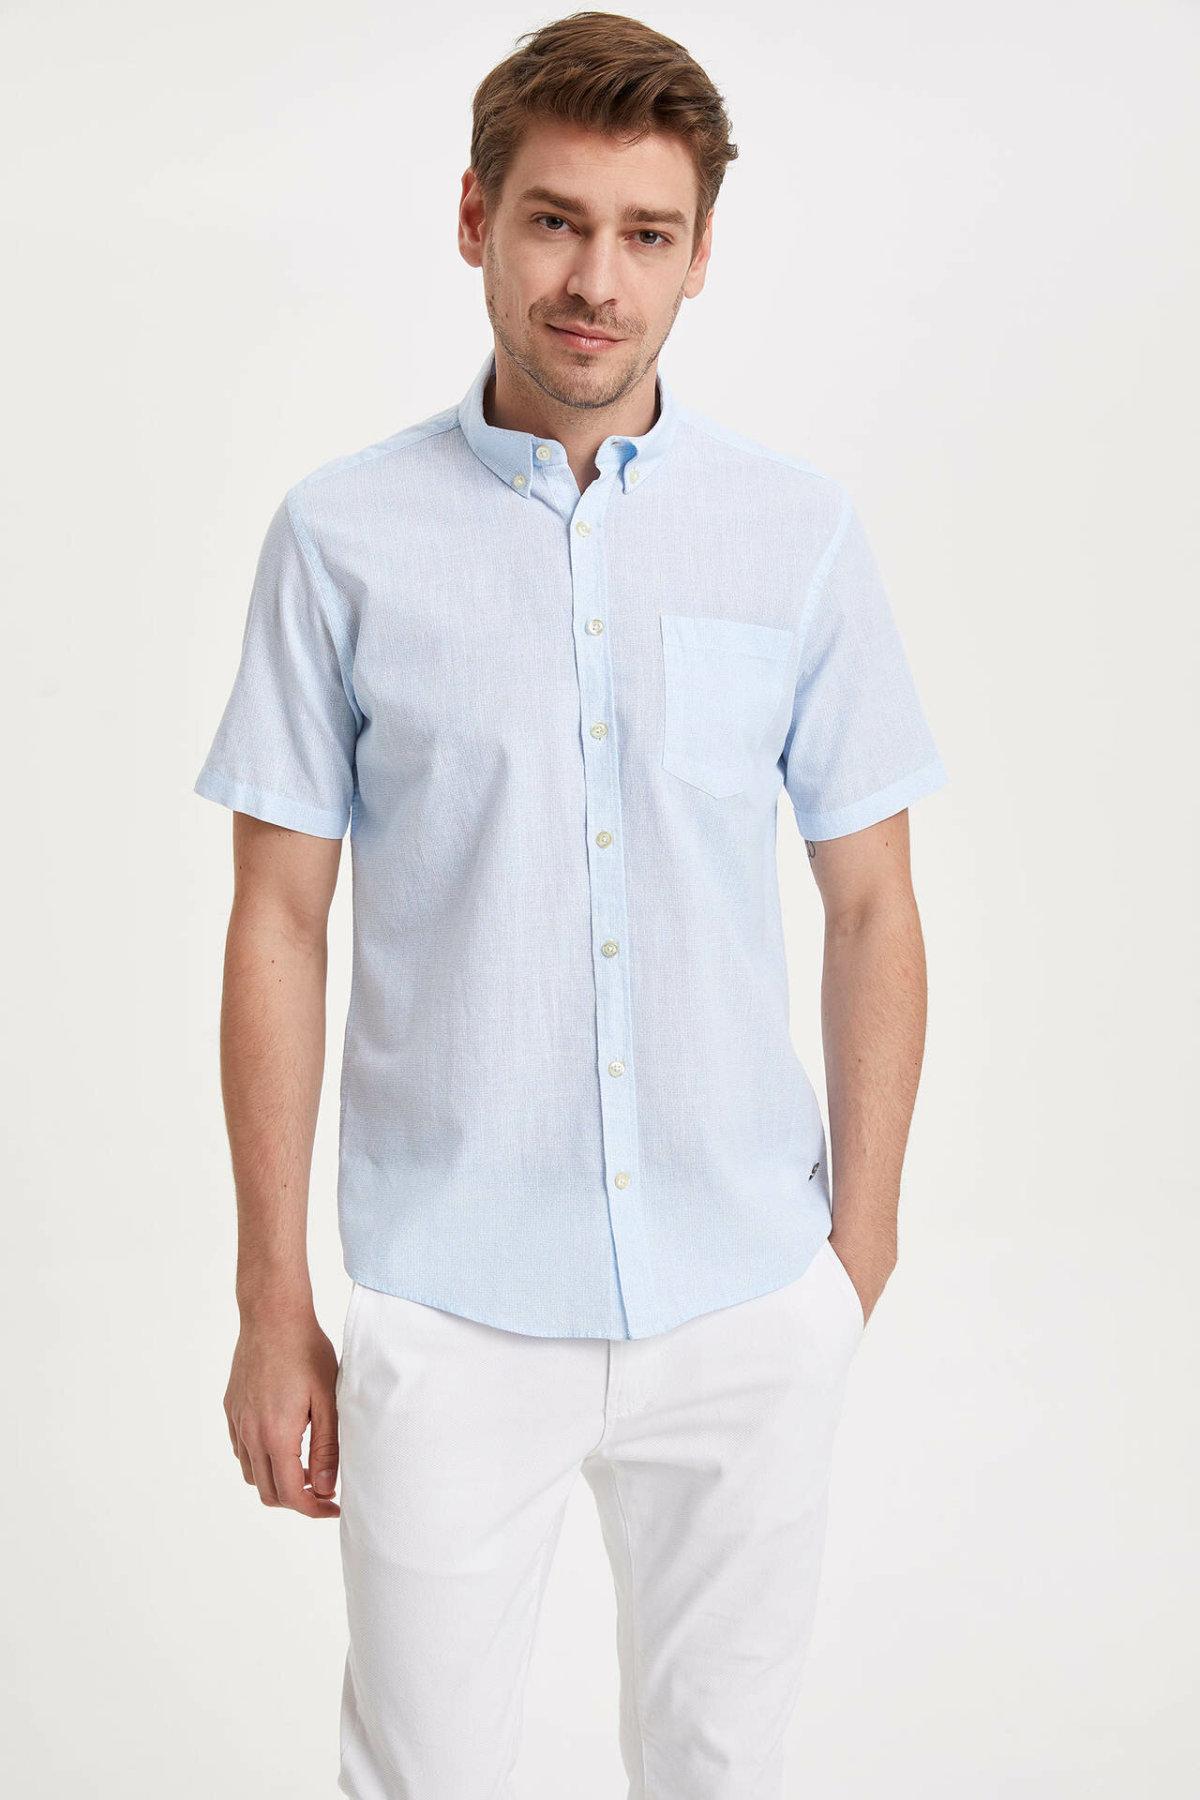 DeFacto Men Fashion Casual Pure Color Short Shirts Lapel Collar Male Shirts Cotton Male Lapel CollarTops New - K3742AZ19SMBE403-K3742AZ19SM